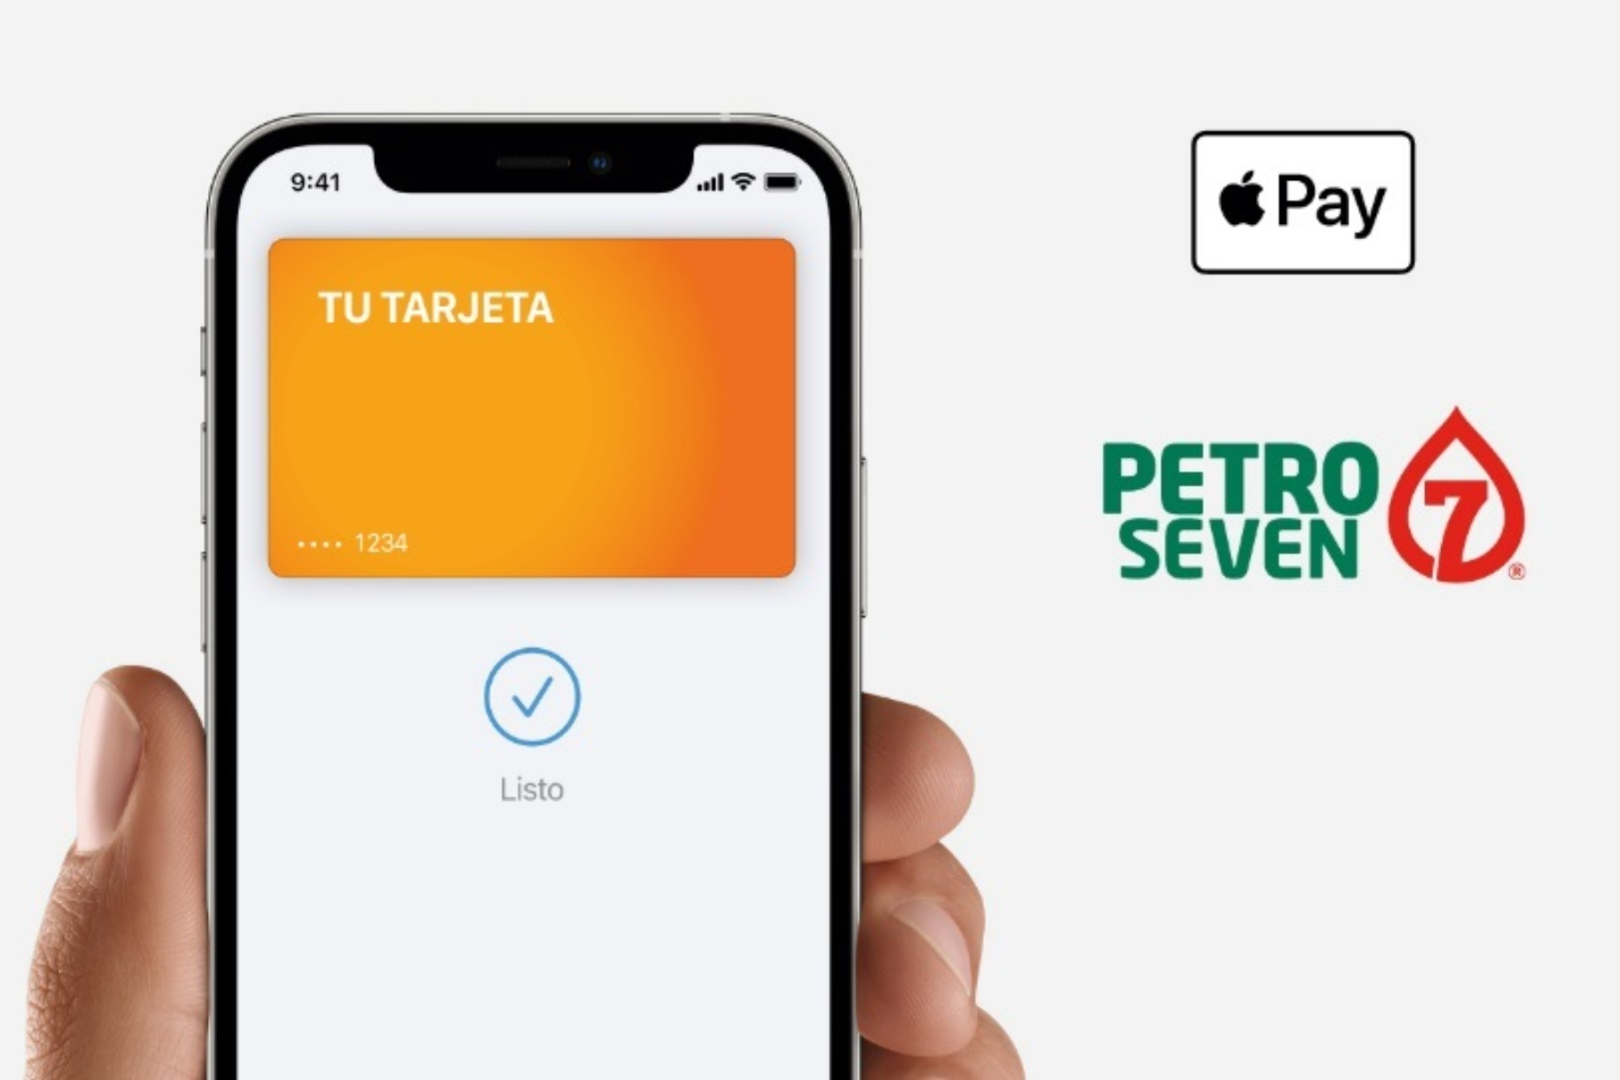 Petro Seven Apple Pay Gasolineras